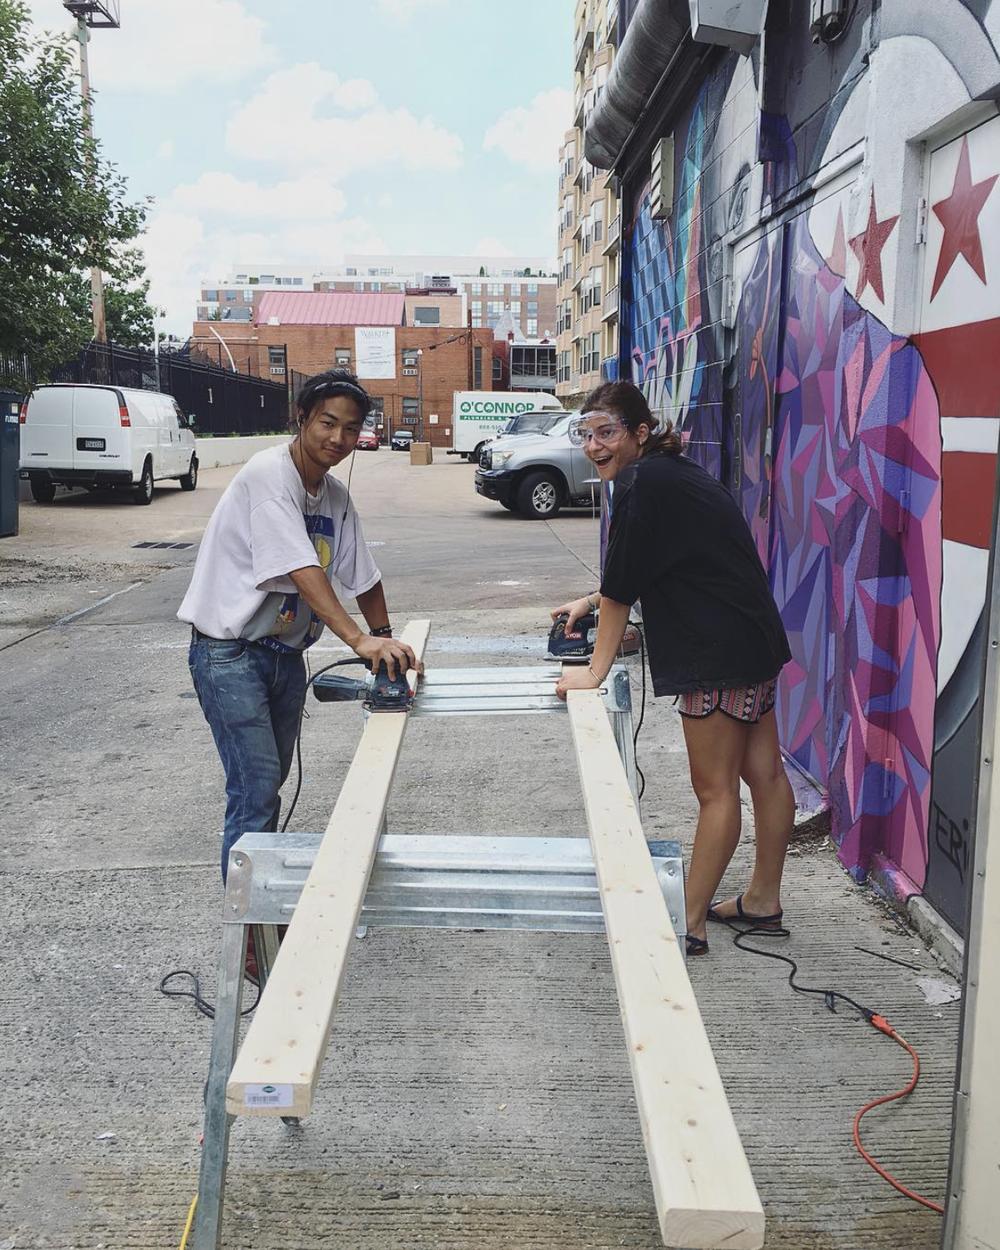 Meet project assistants Kohei Urakami ( @moral_punishment ) and Kenzi Waddell ( @kamikenzi_ ). #permacounterculture  #punk  #acreativedc